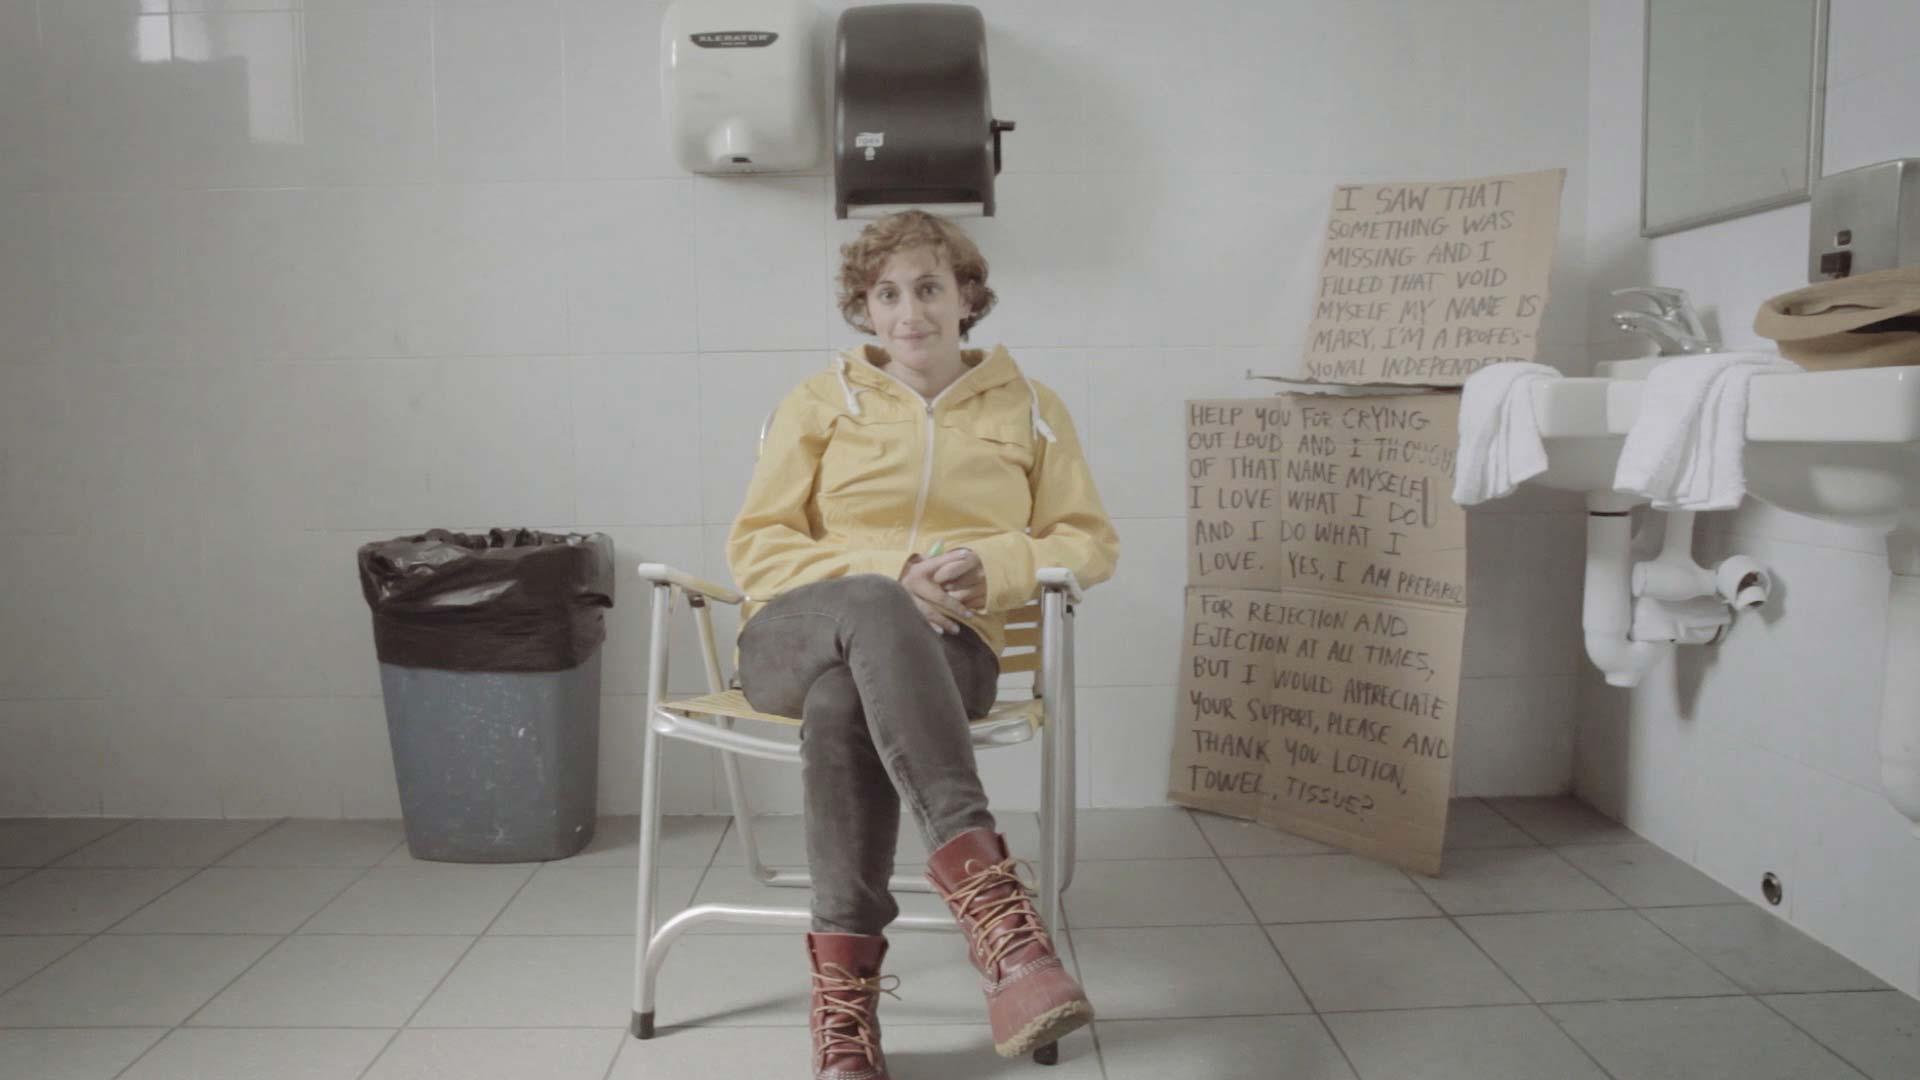 Bathroom Attendant freelance bathroom attendant – ifc